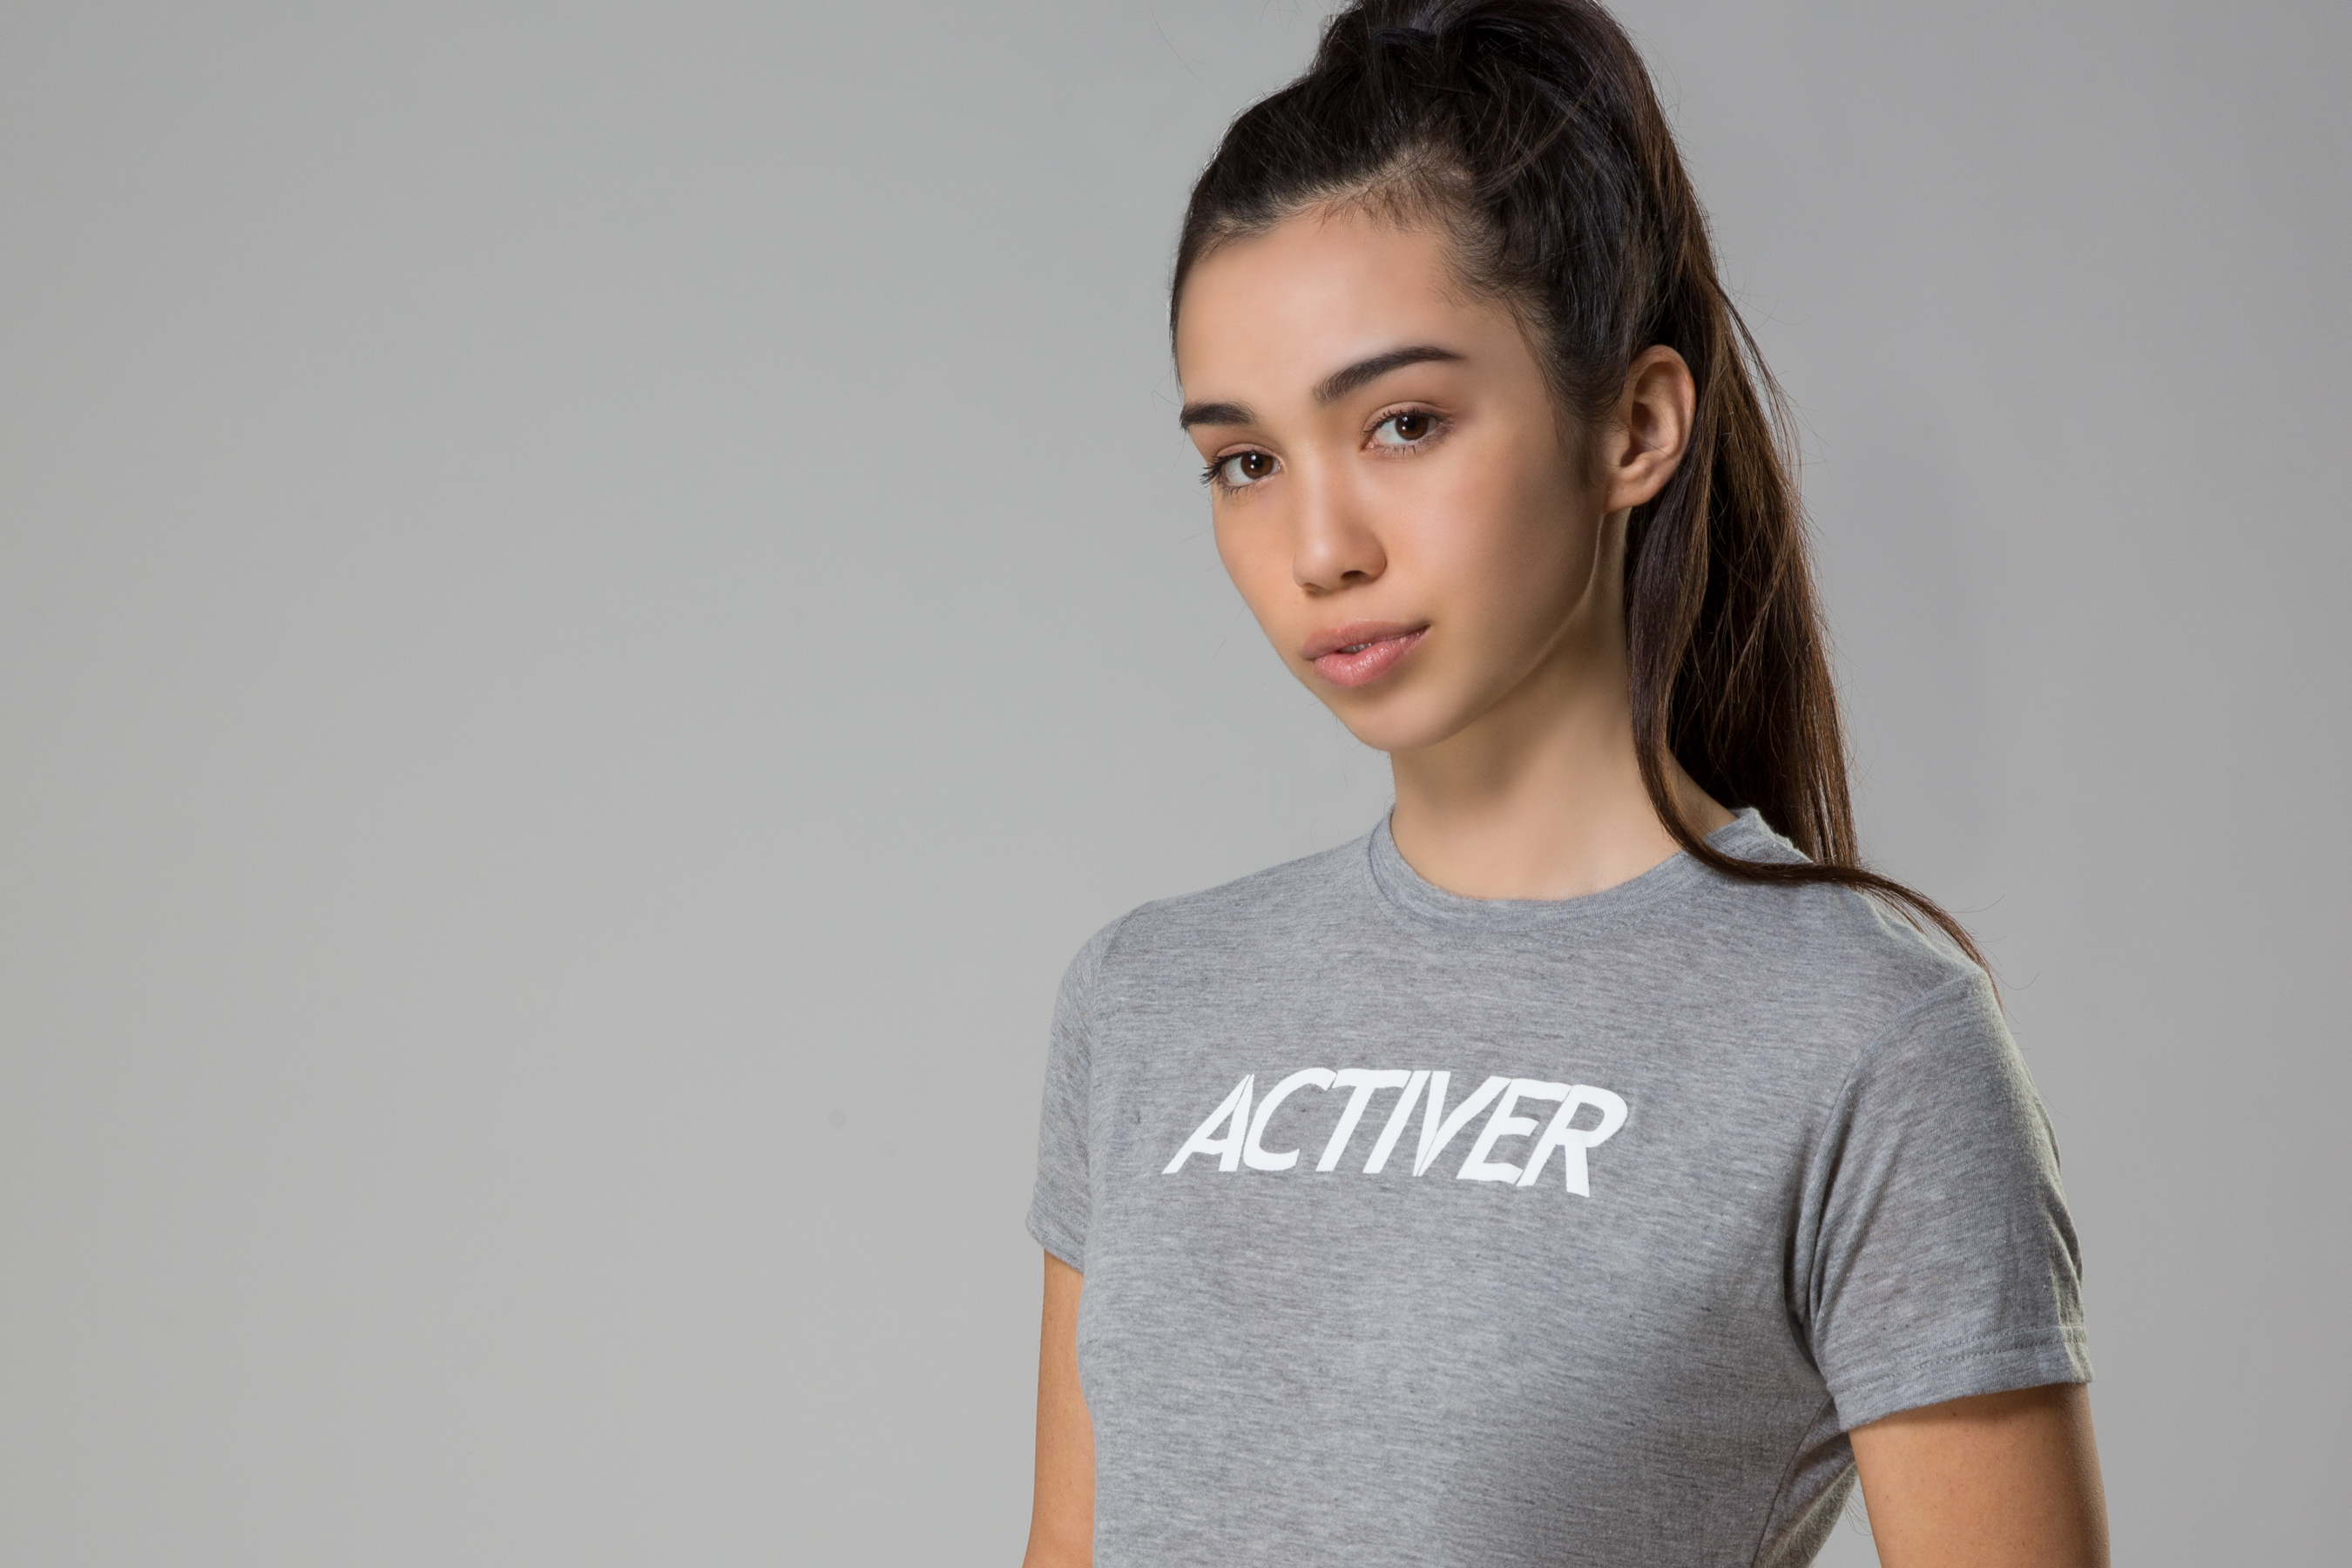 Acitver